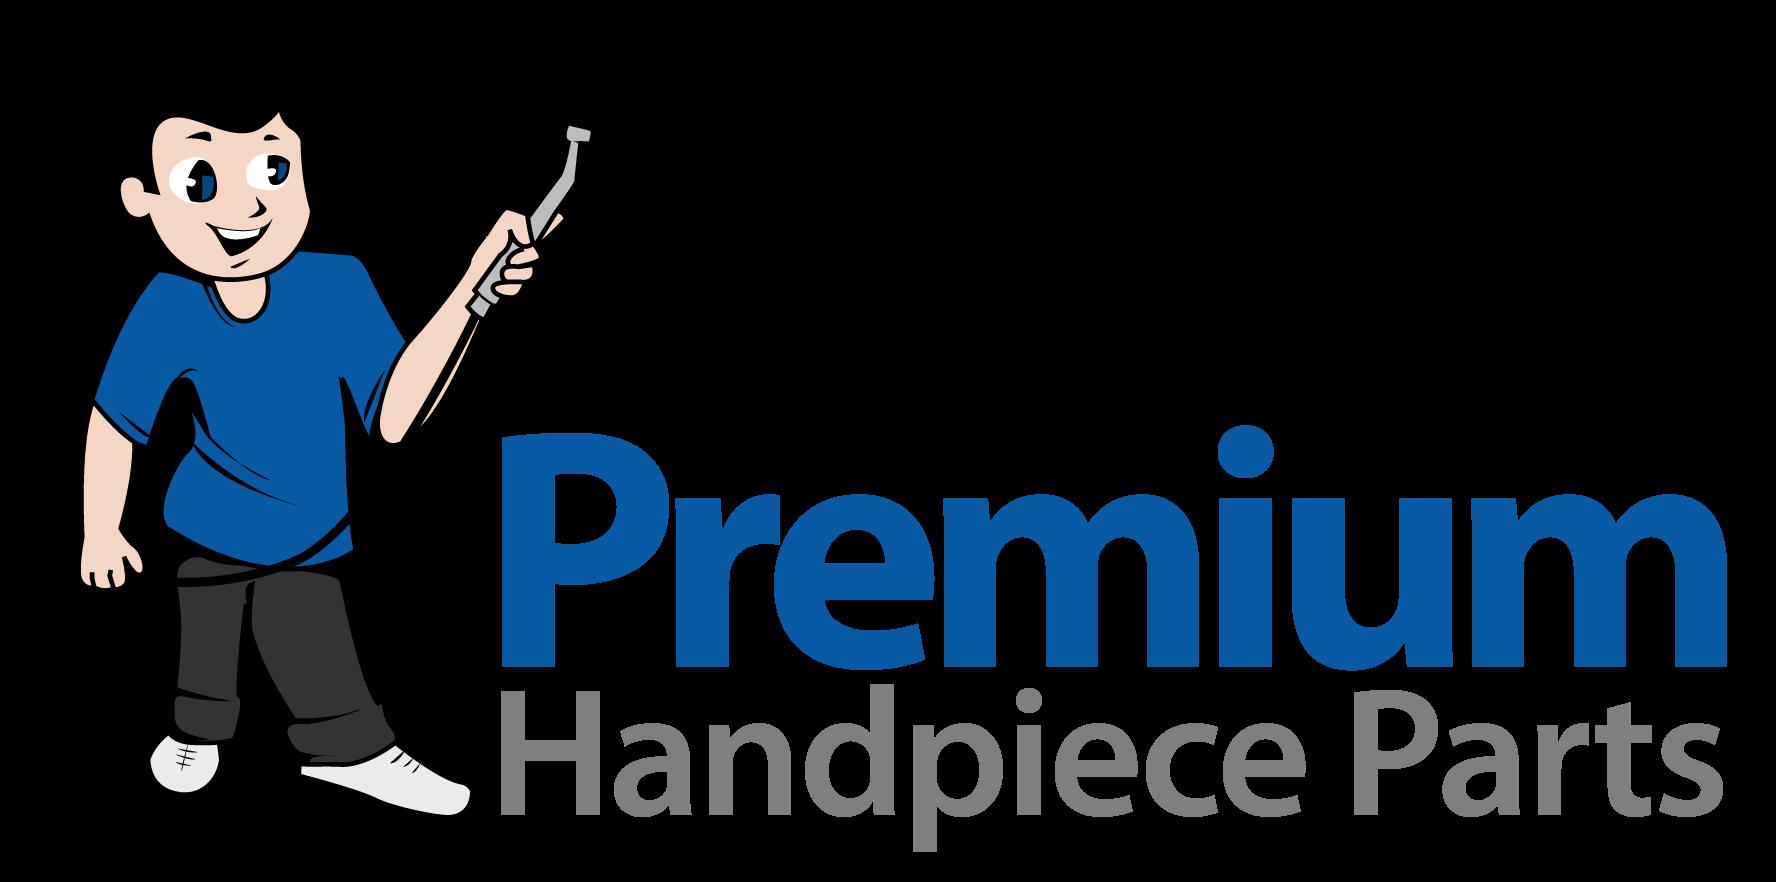 Premium Handpiece Parts